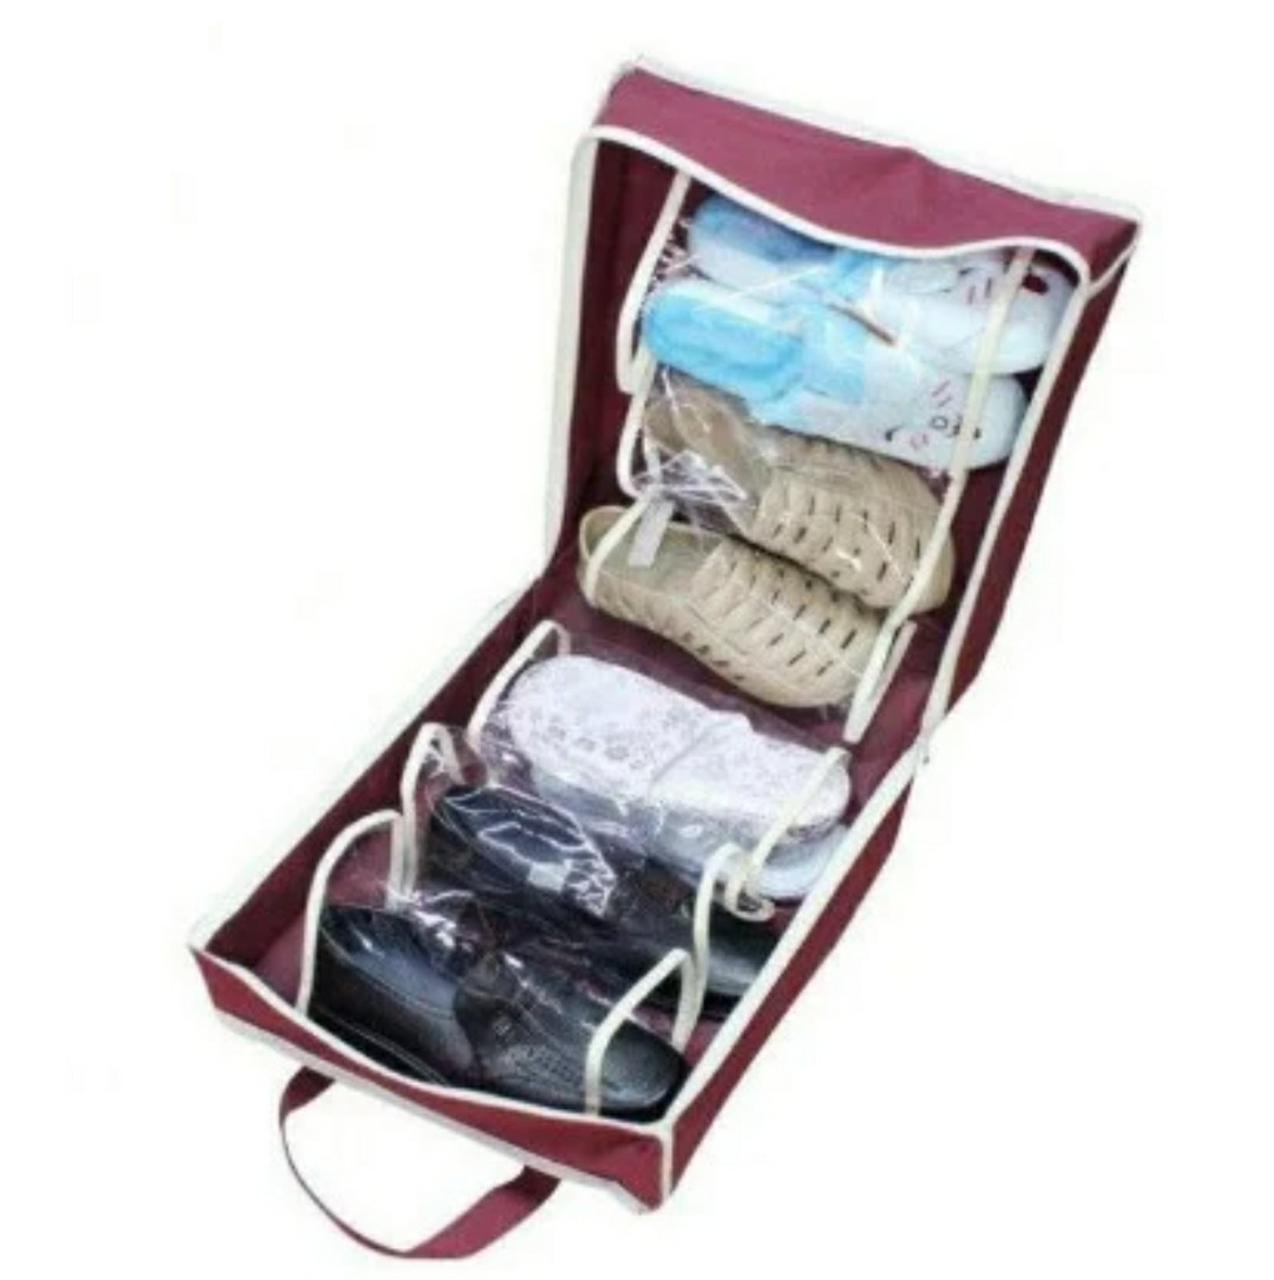 Сумка органайзер для обуви Shoe Tote на 6 пар